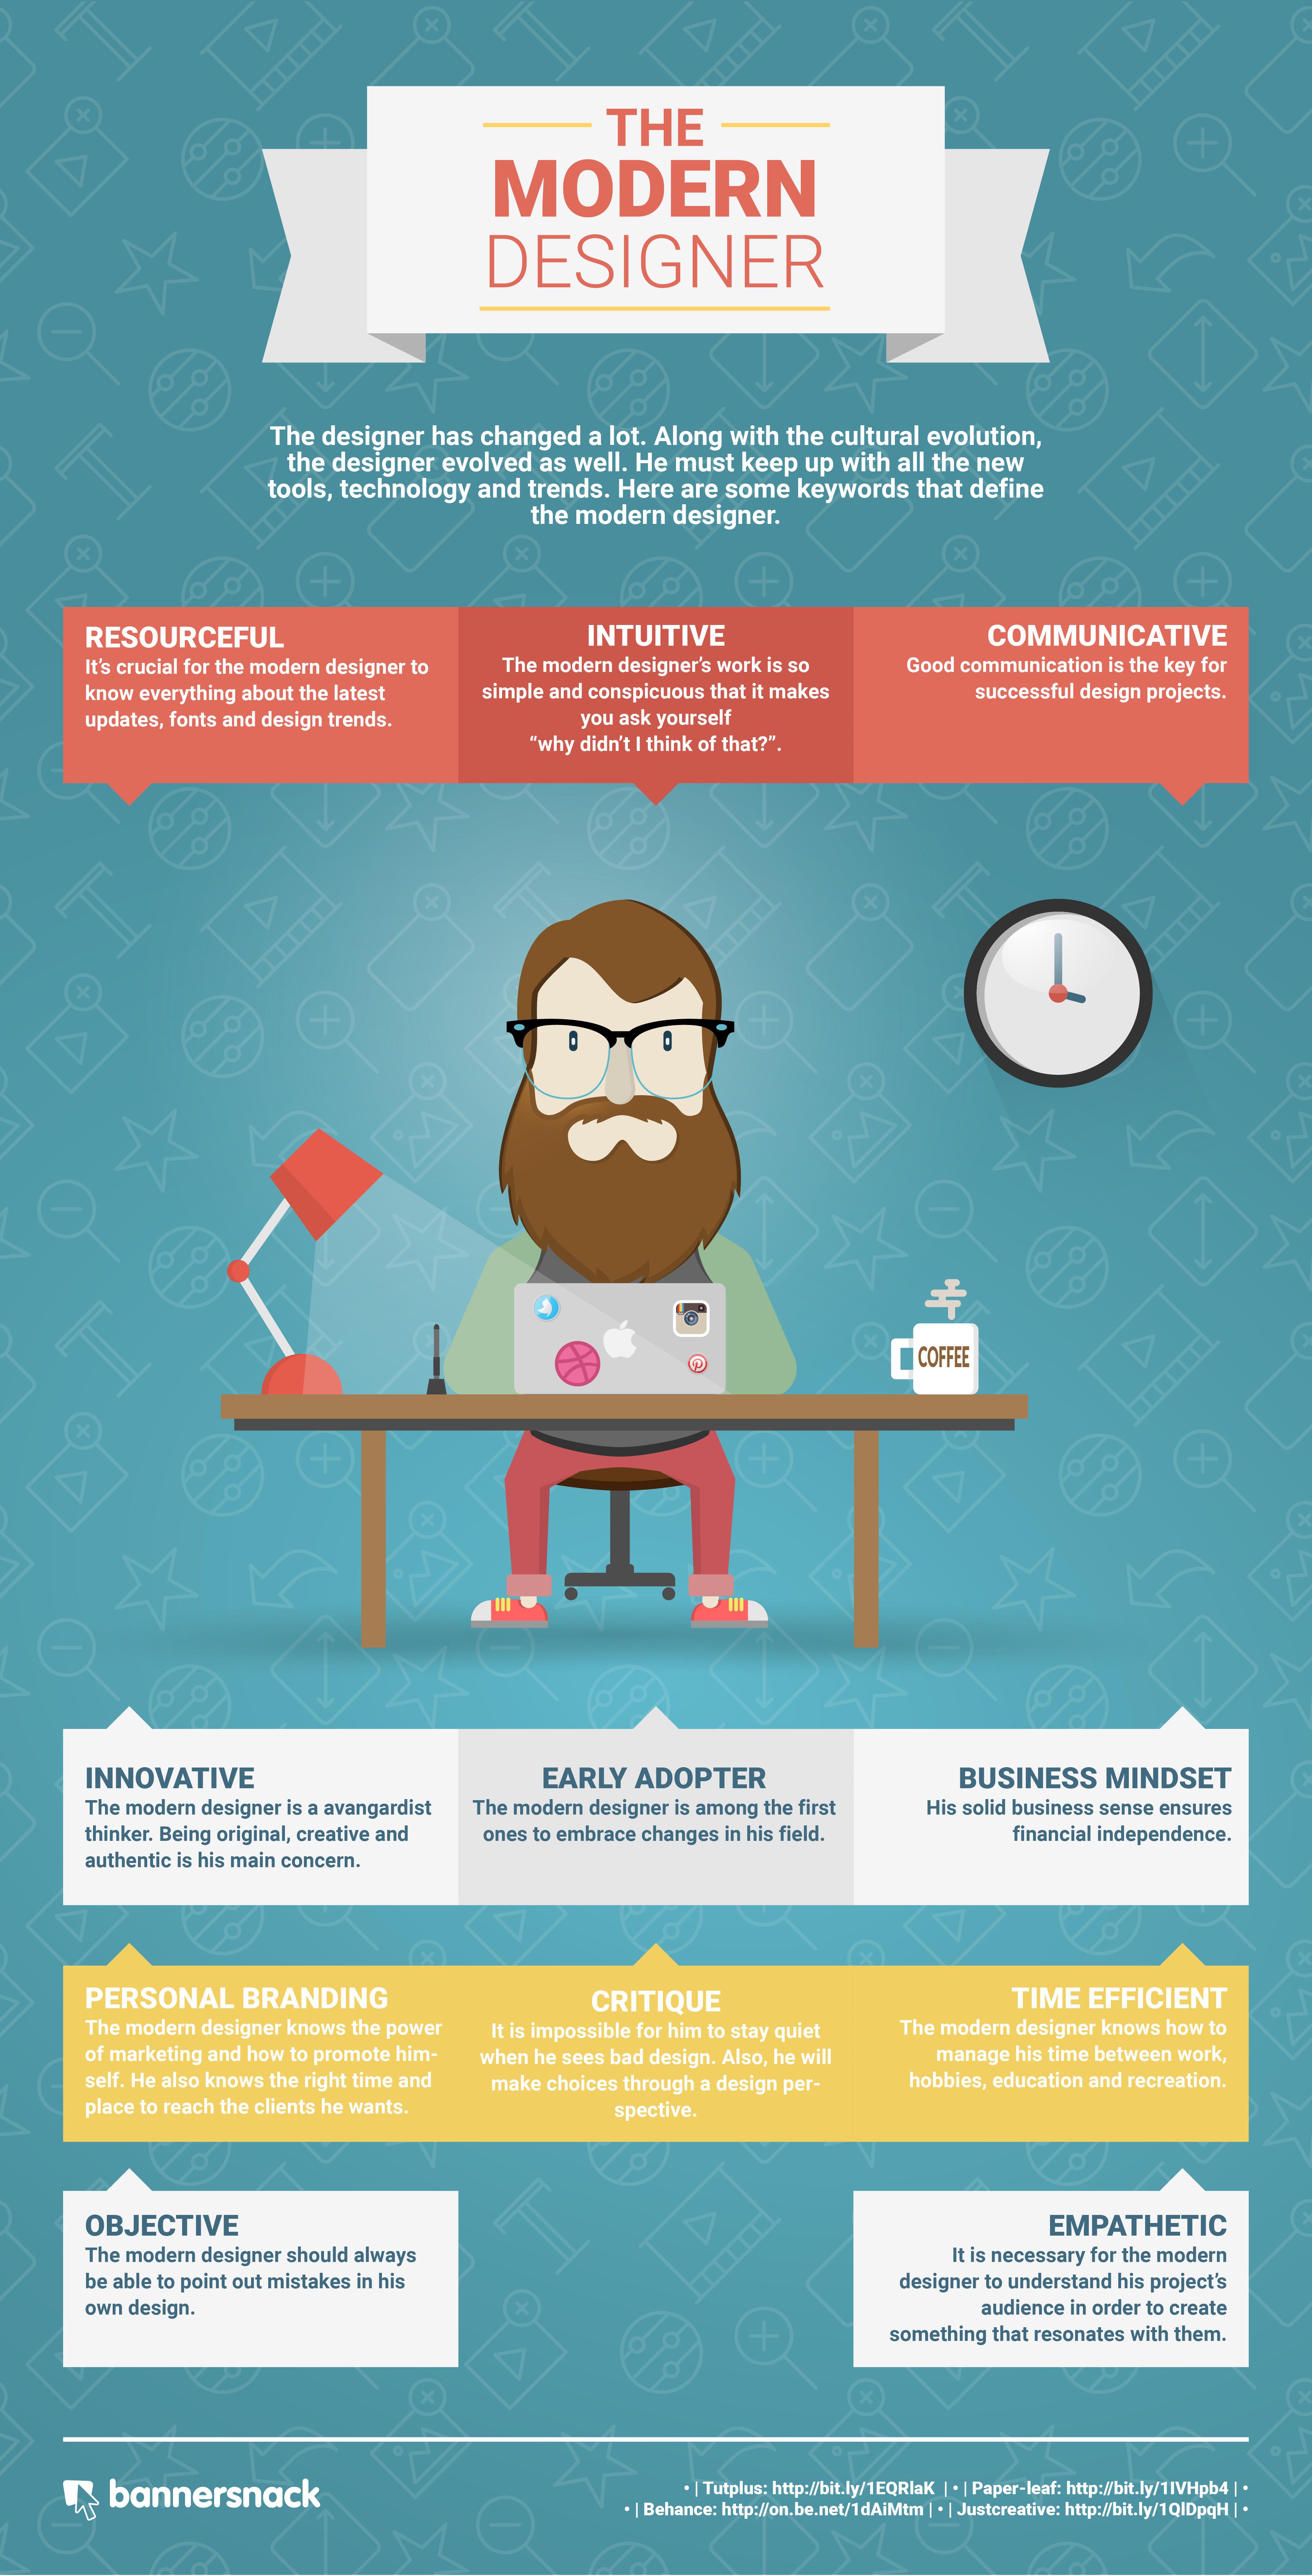 Infographic: The modern designer